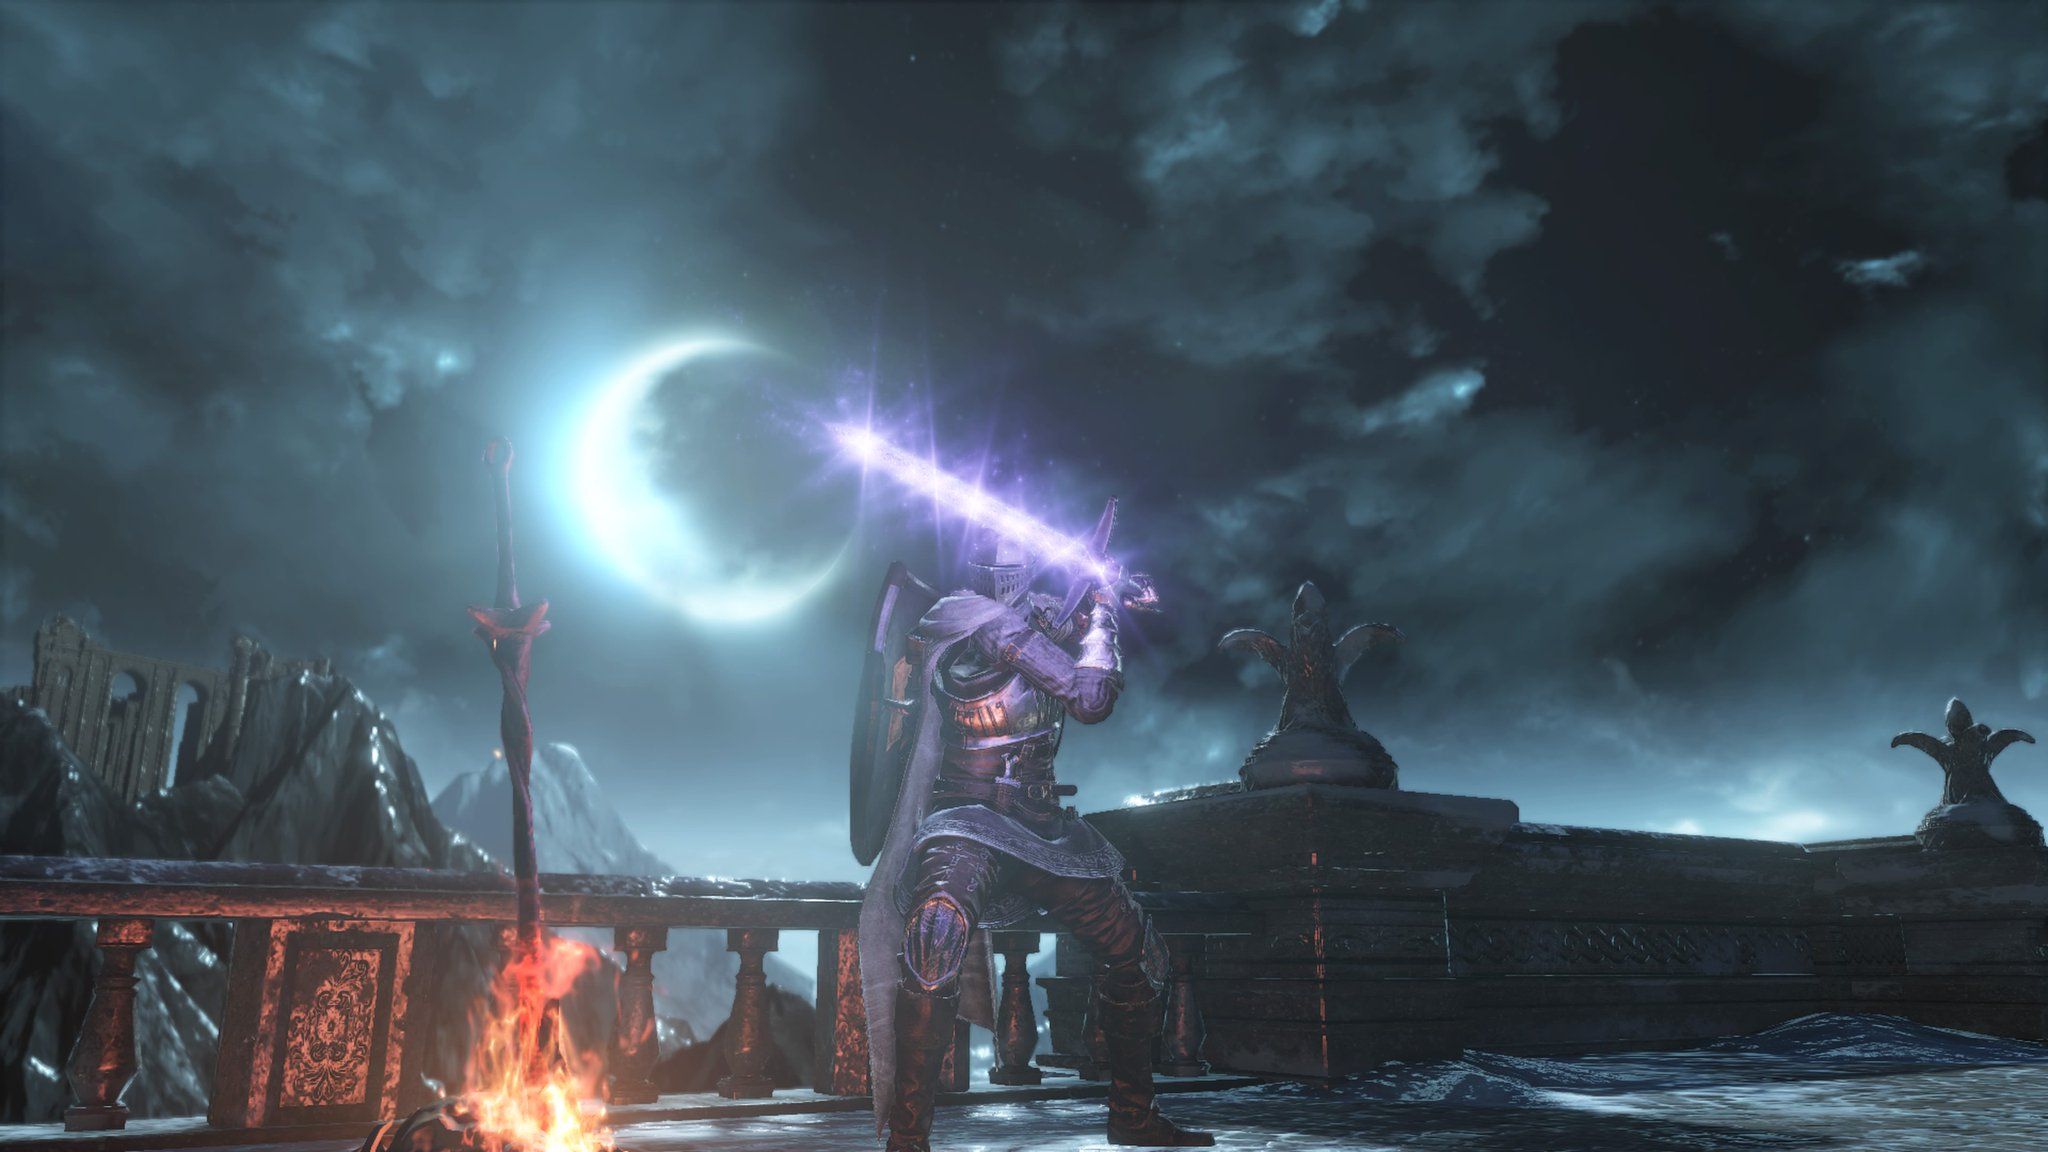 Dark Souls III: The Fire Fades - Short Review - saveasdoc